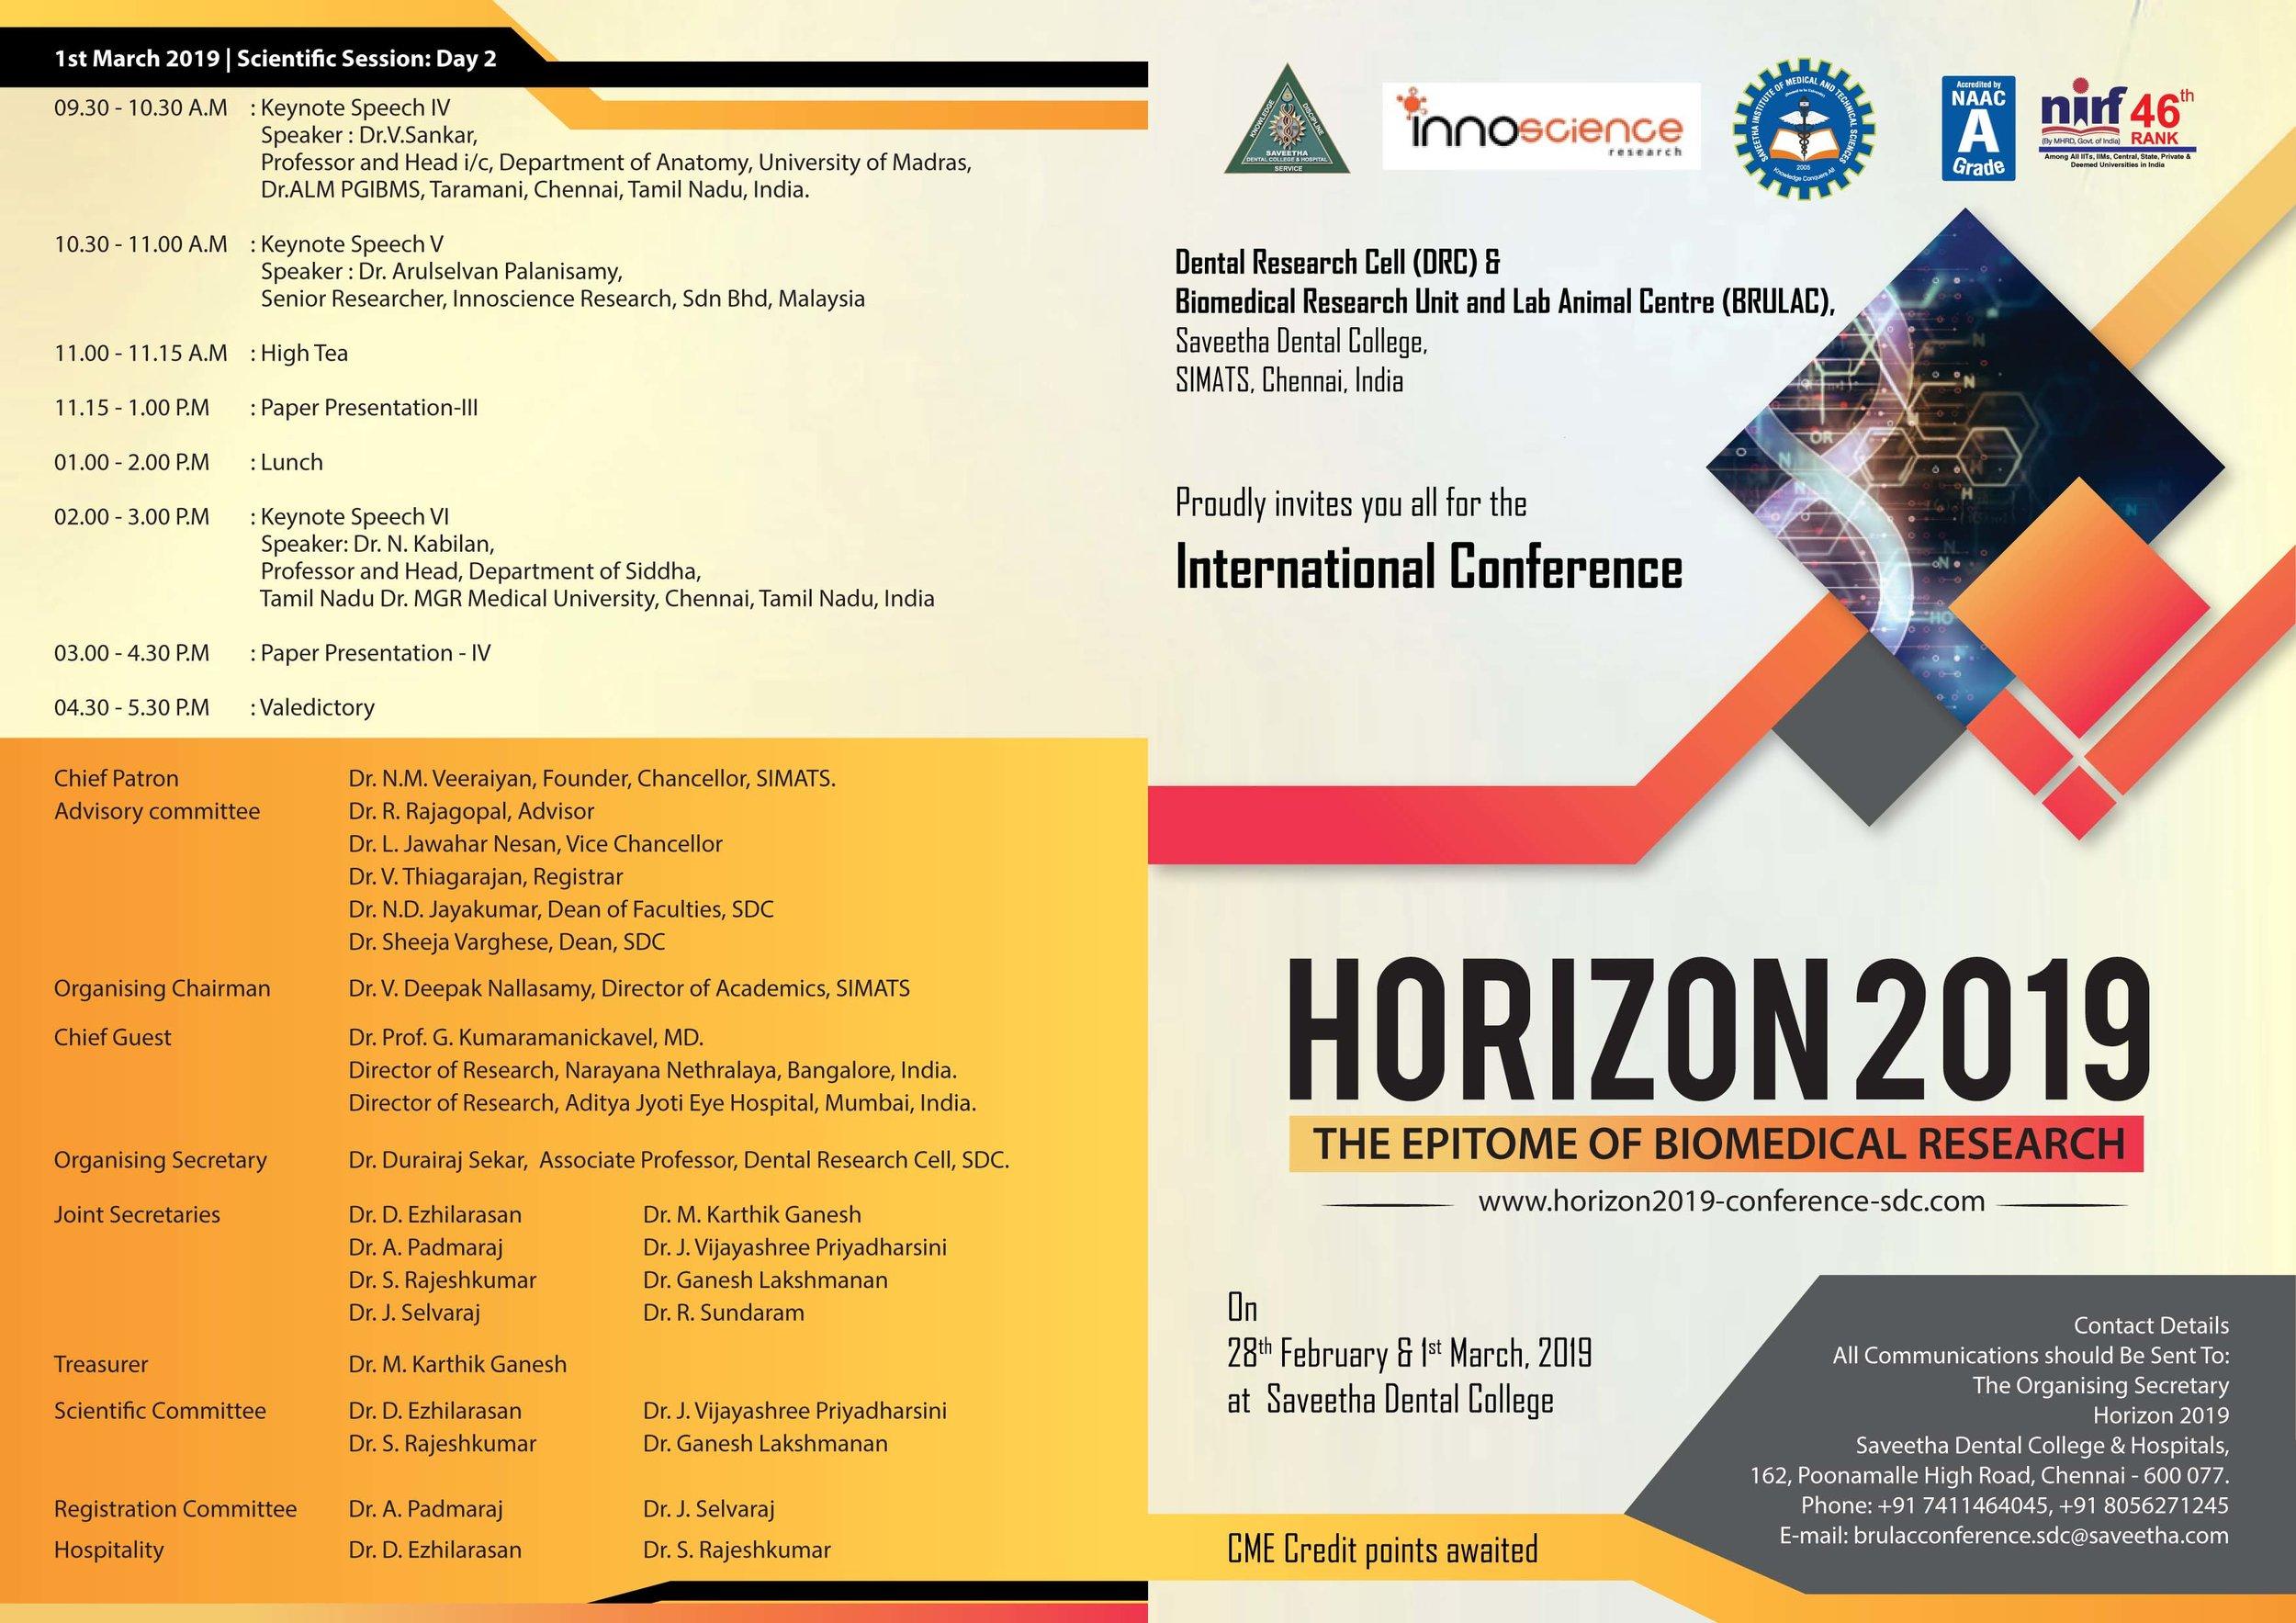 HORIZON 2019-DRC-BRULAC Conference 3.jpg